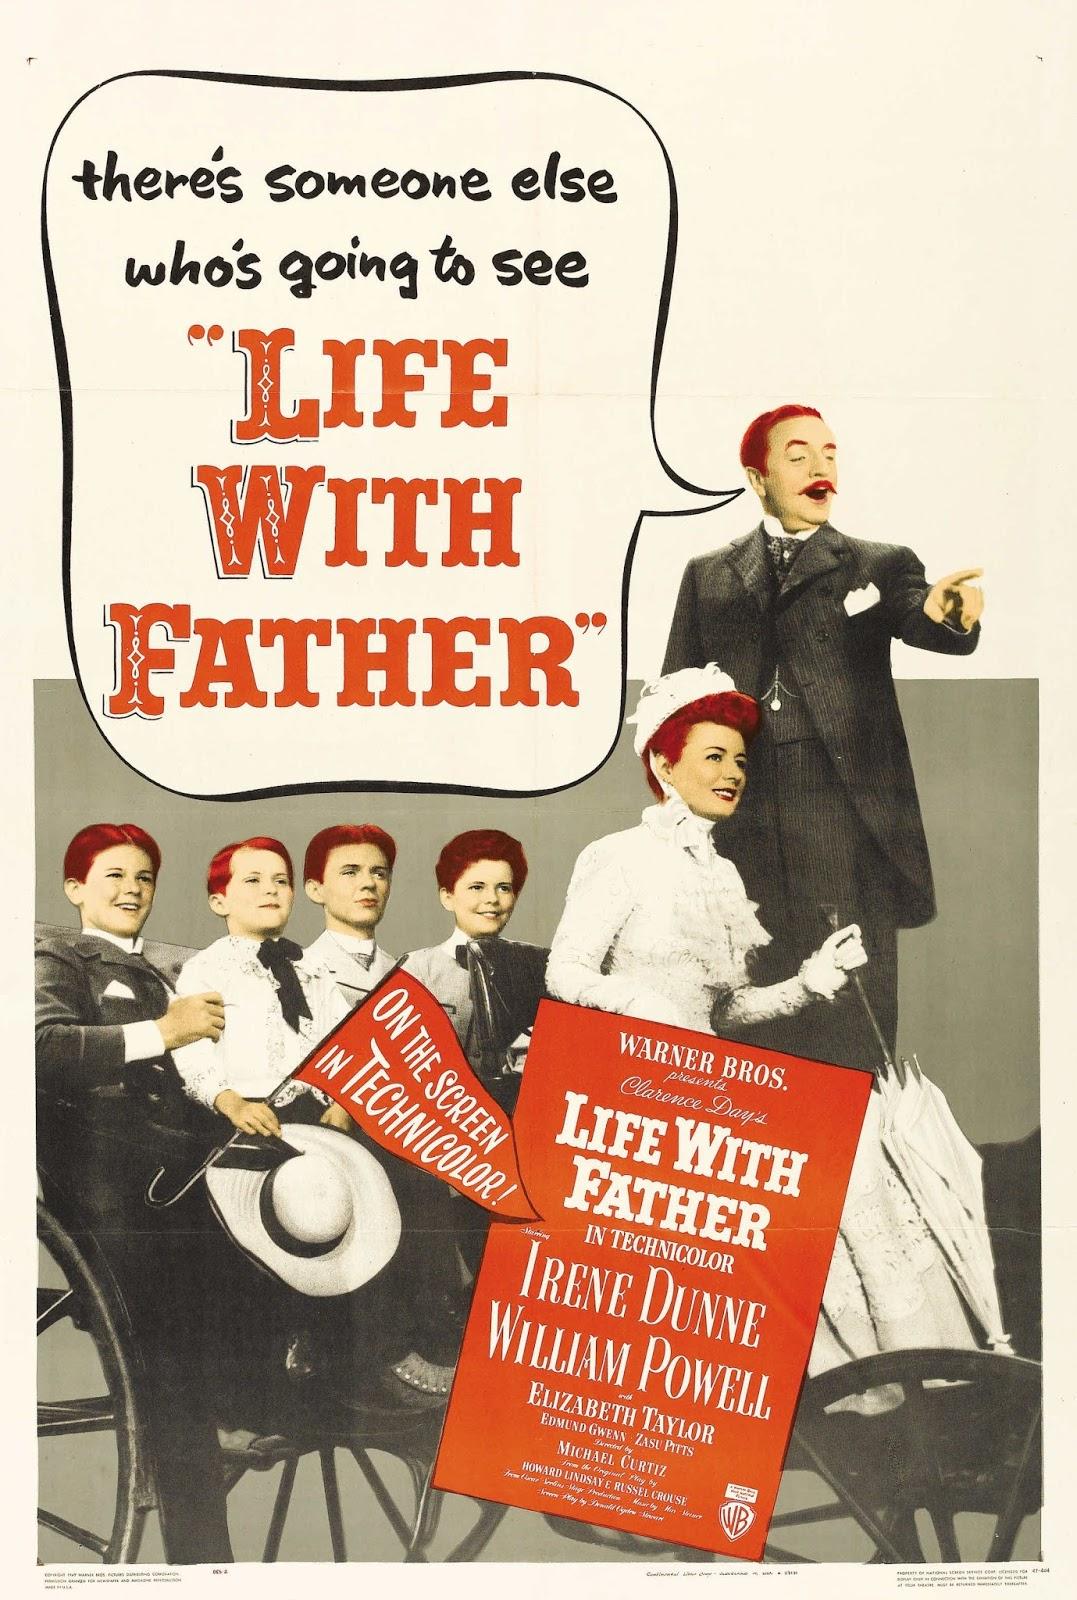 Film Friday: Mister Roberts (1955)